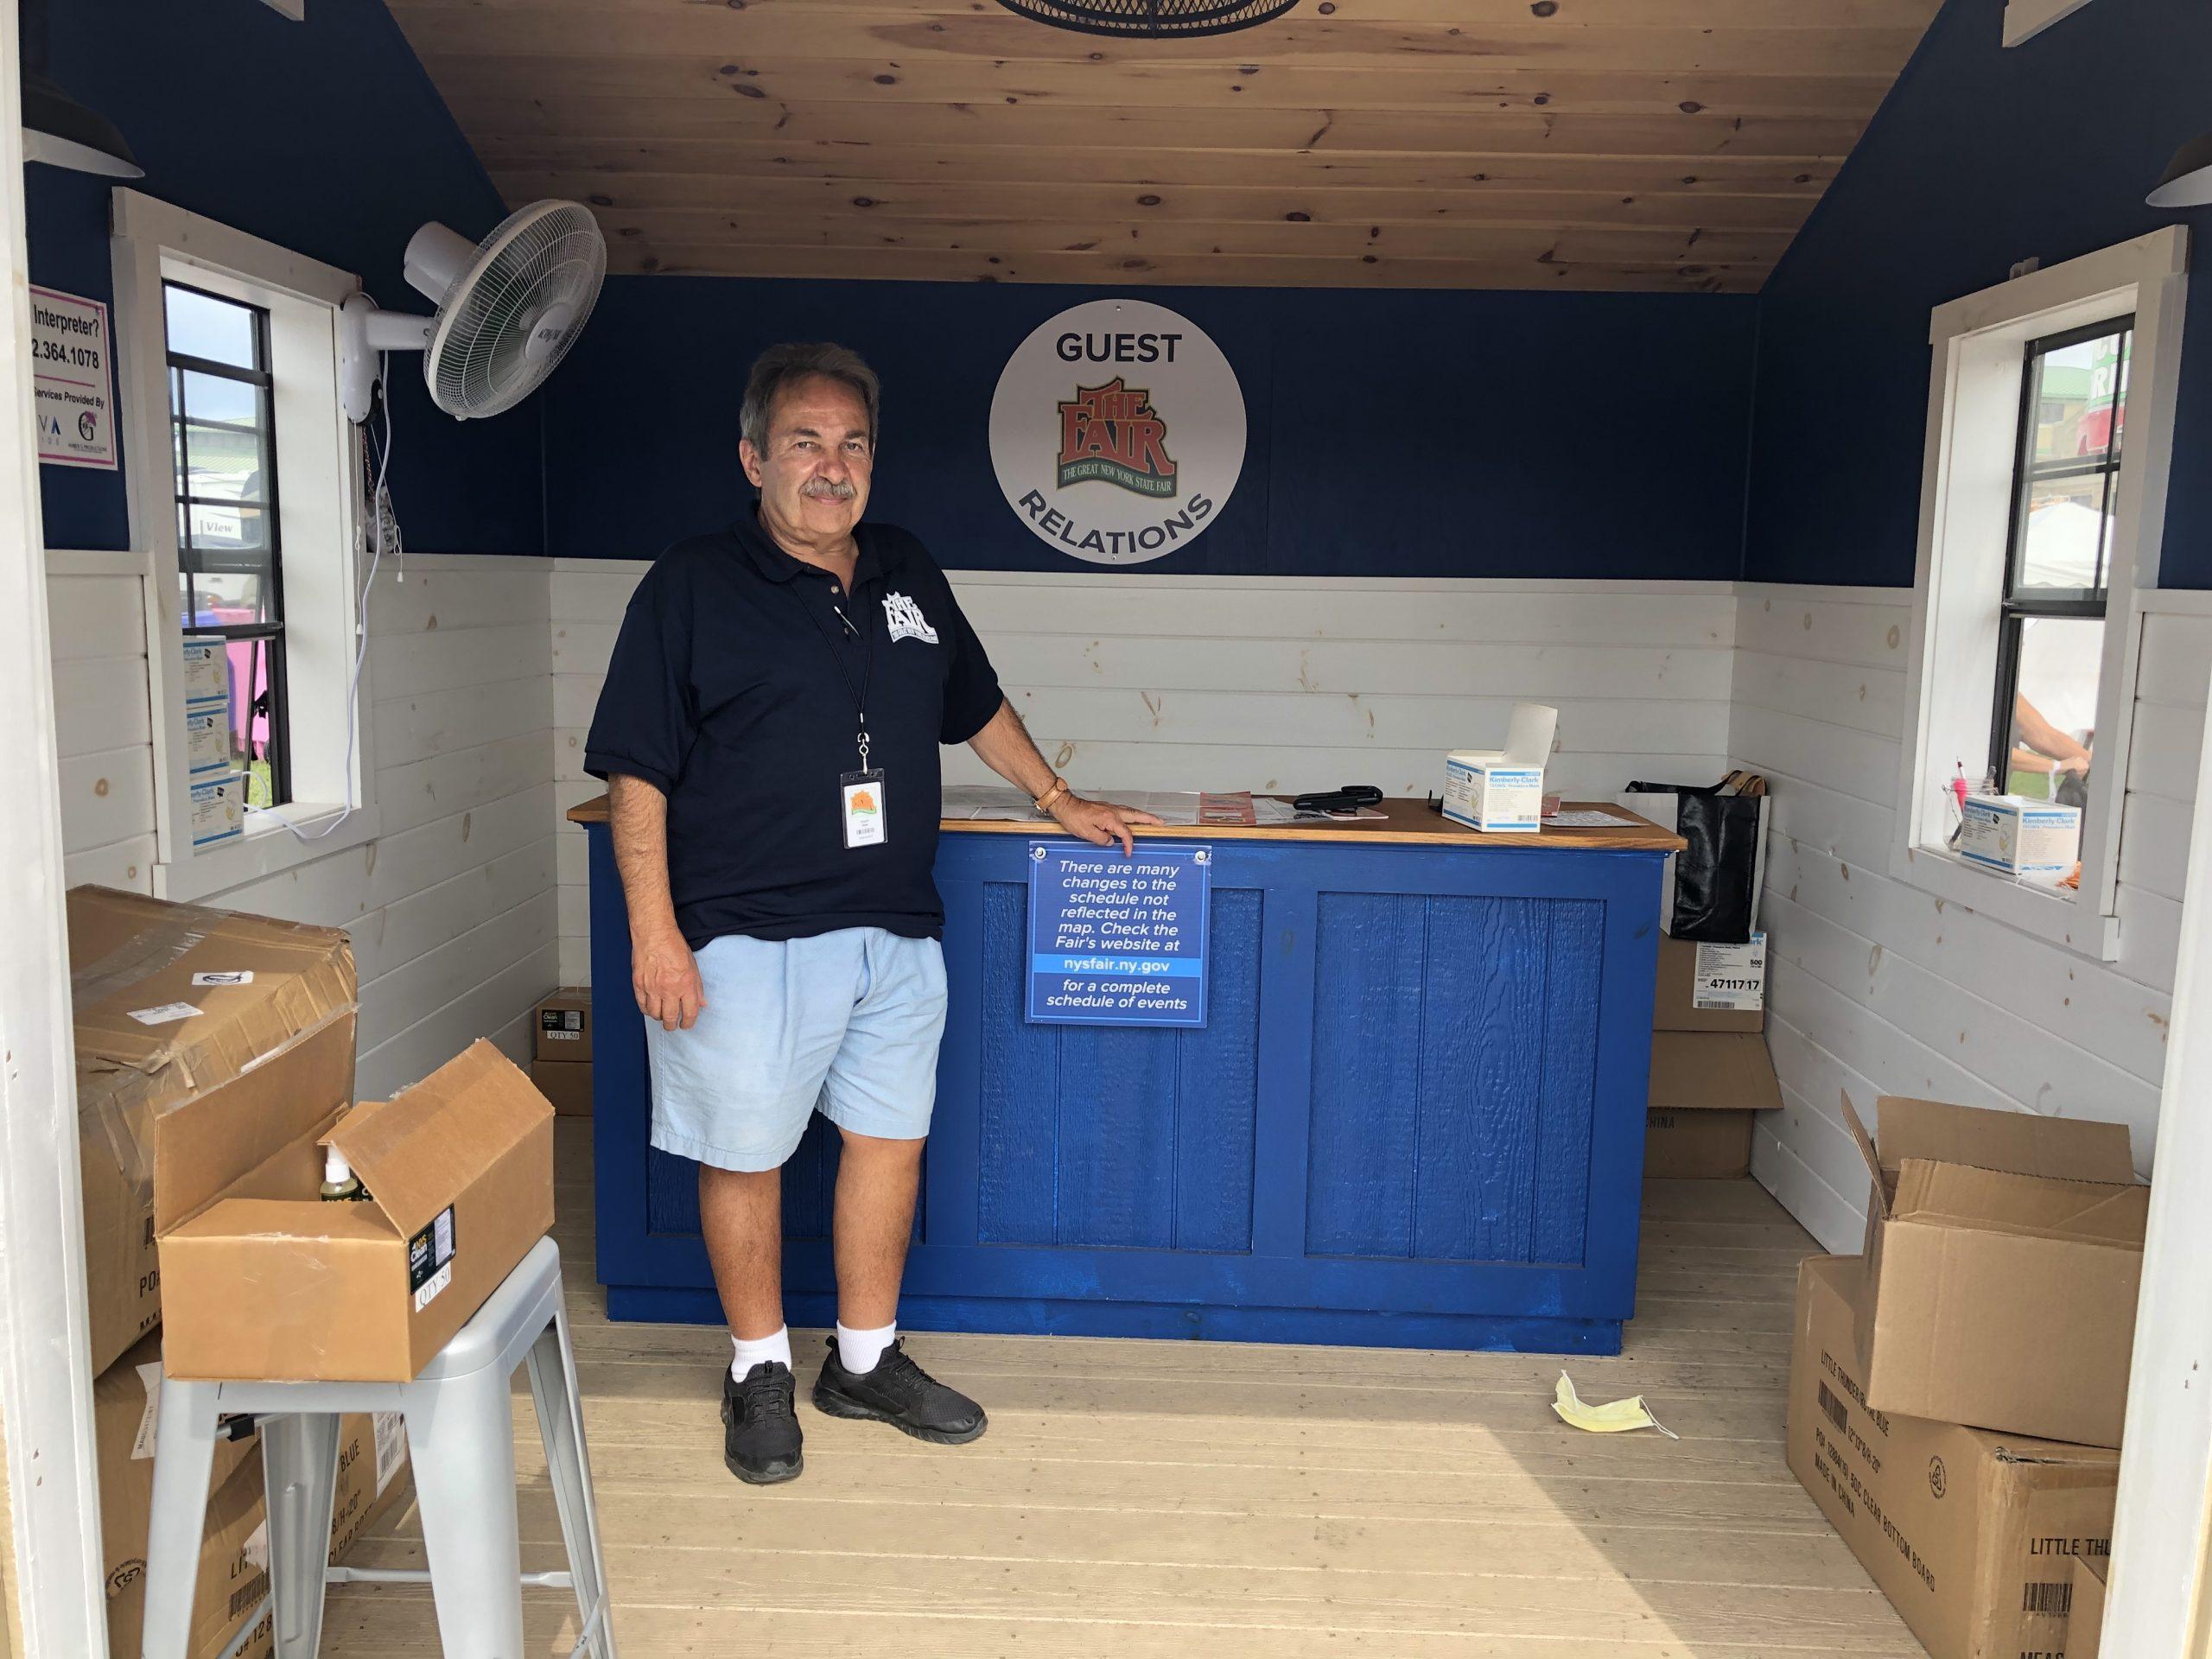 John. De Carlo, New York State Fair employee, poses near his work station.